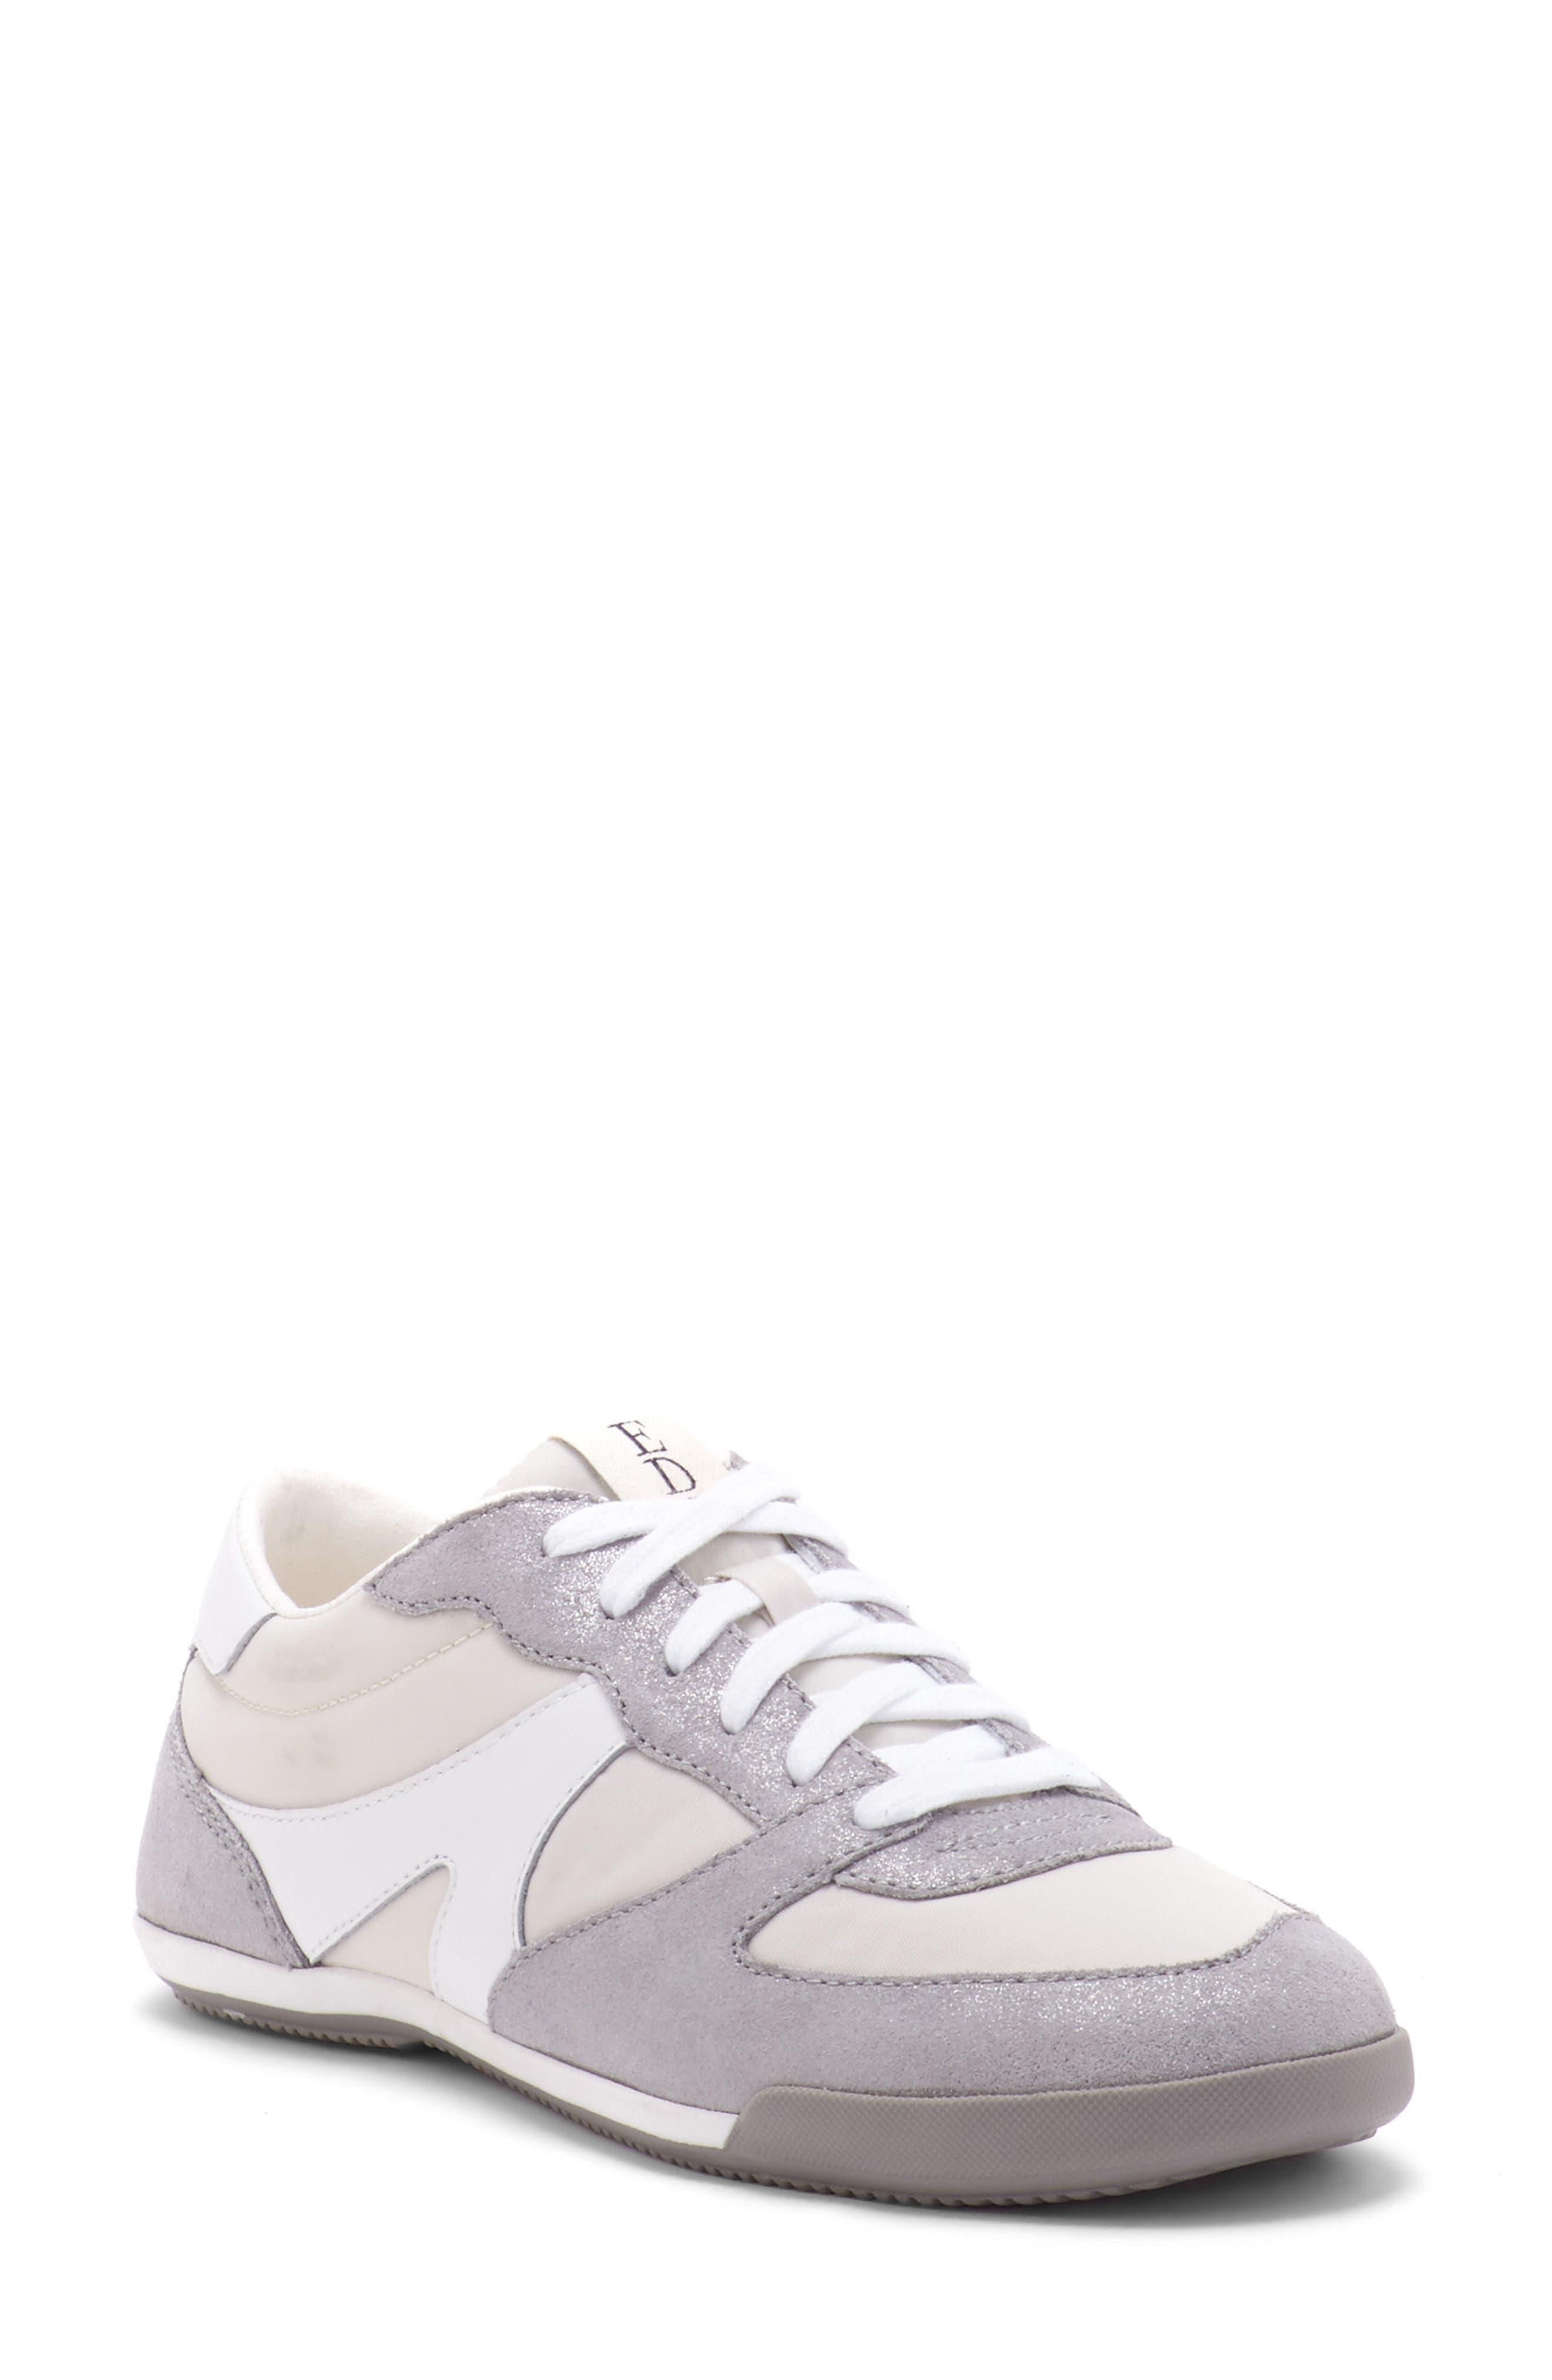 Nordstrom Puma Womens Shoes